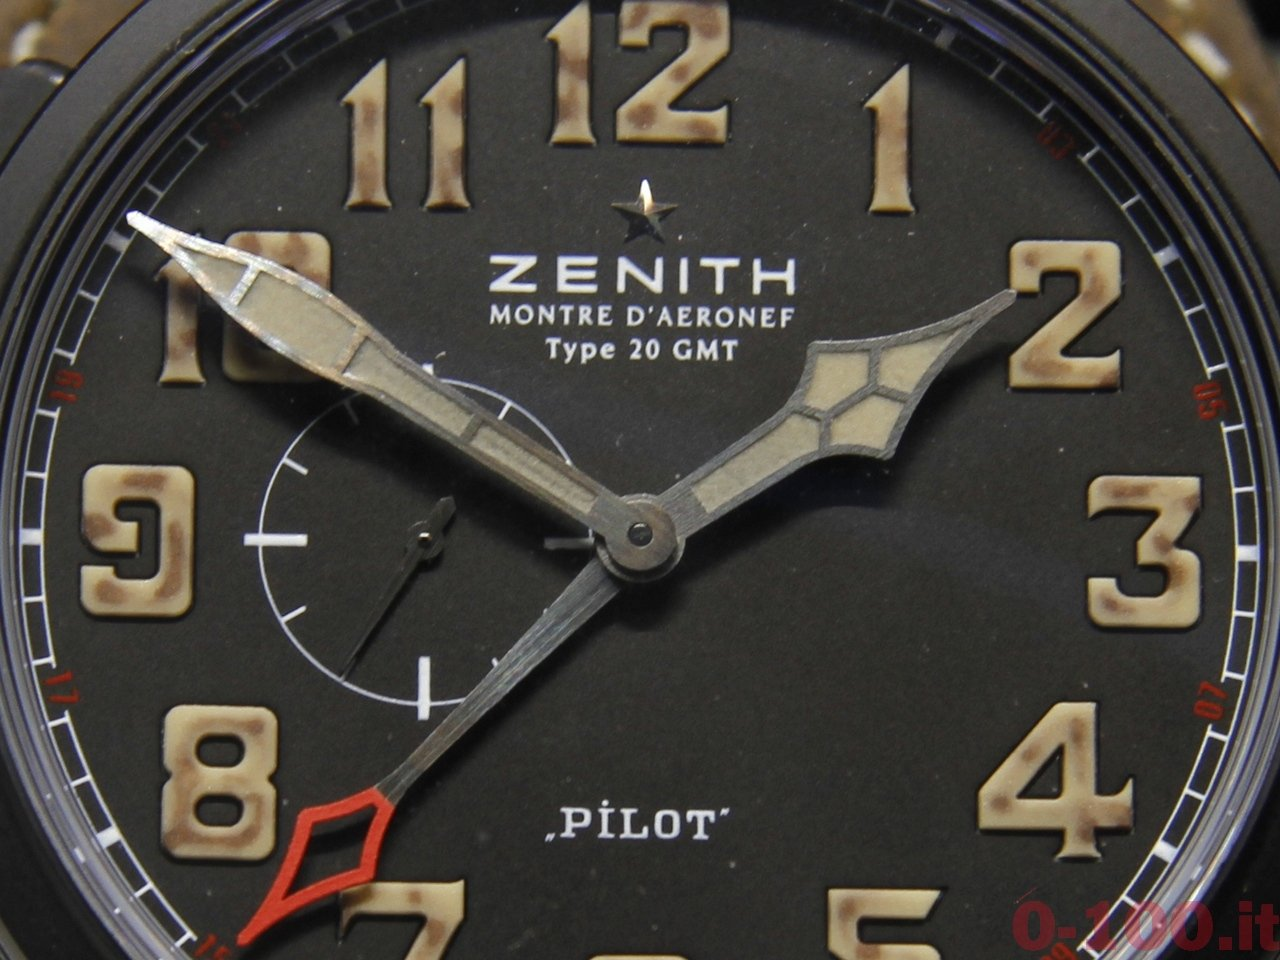 zenith-pilot-montre-daeronef-type-20-gmt-1903-baselworld-2014_1